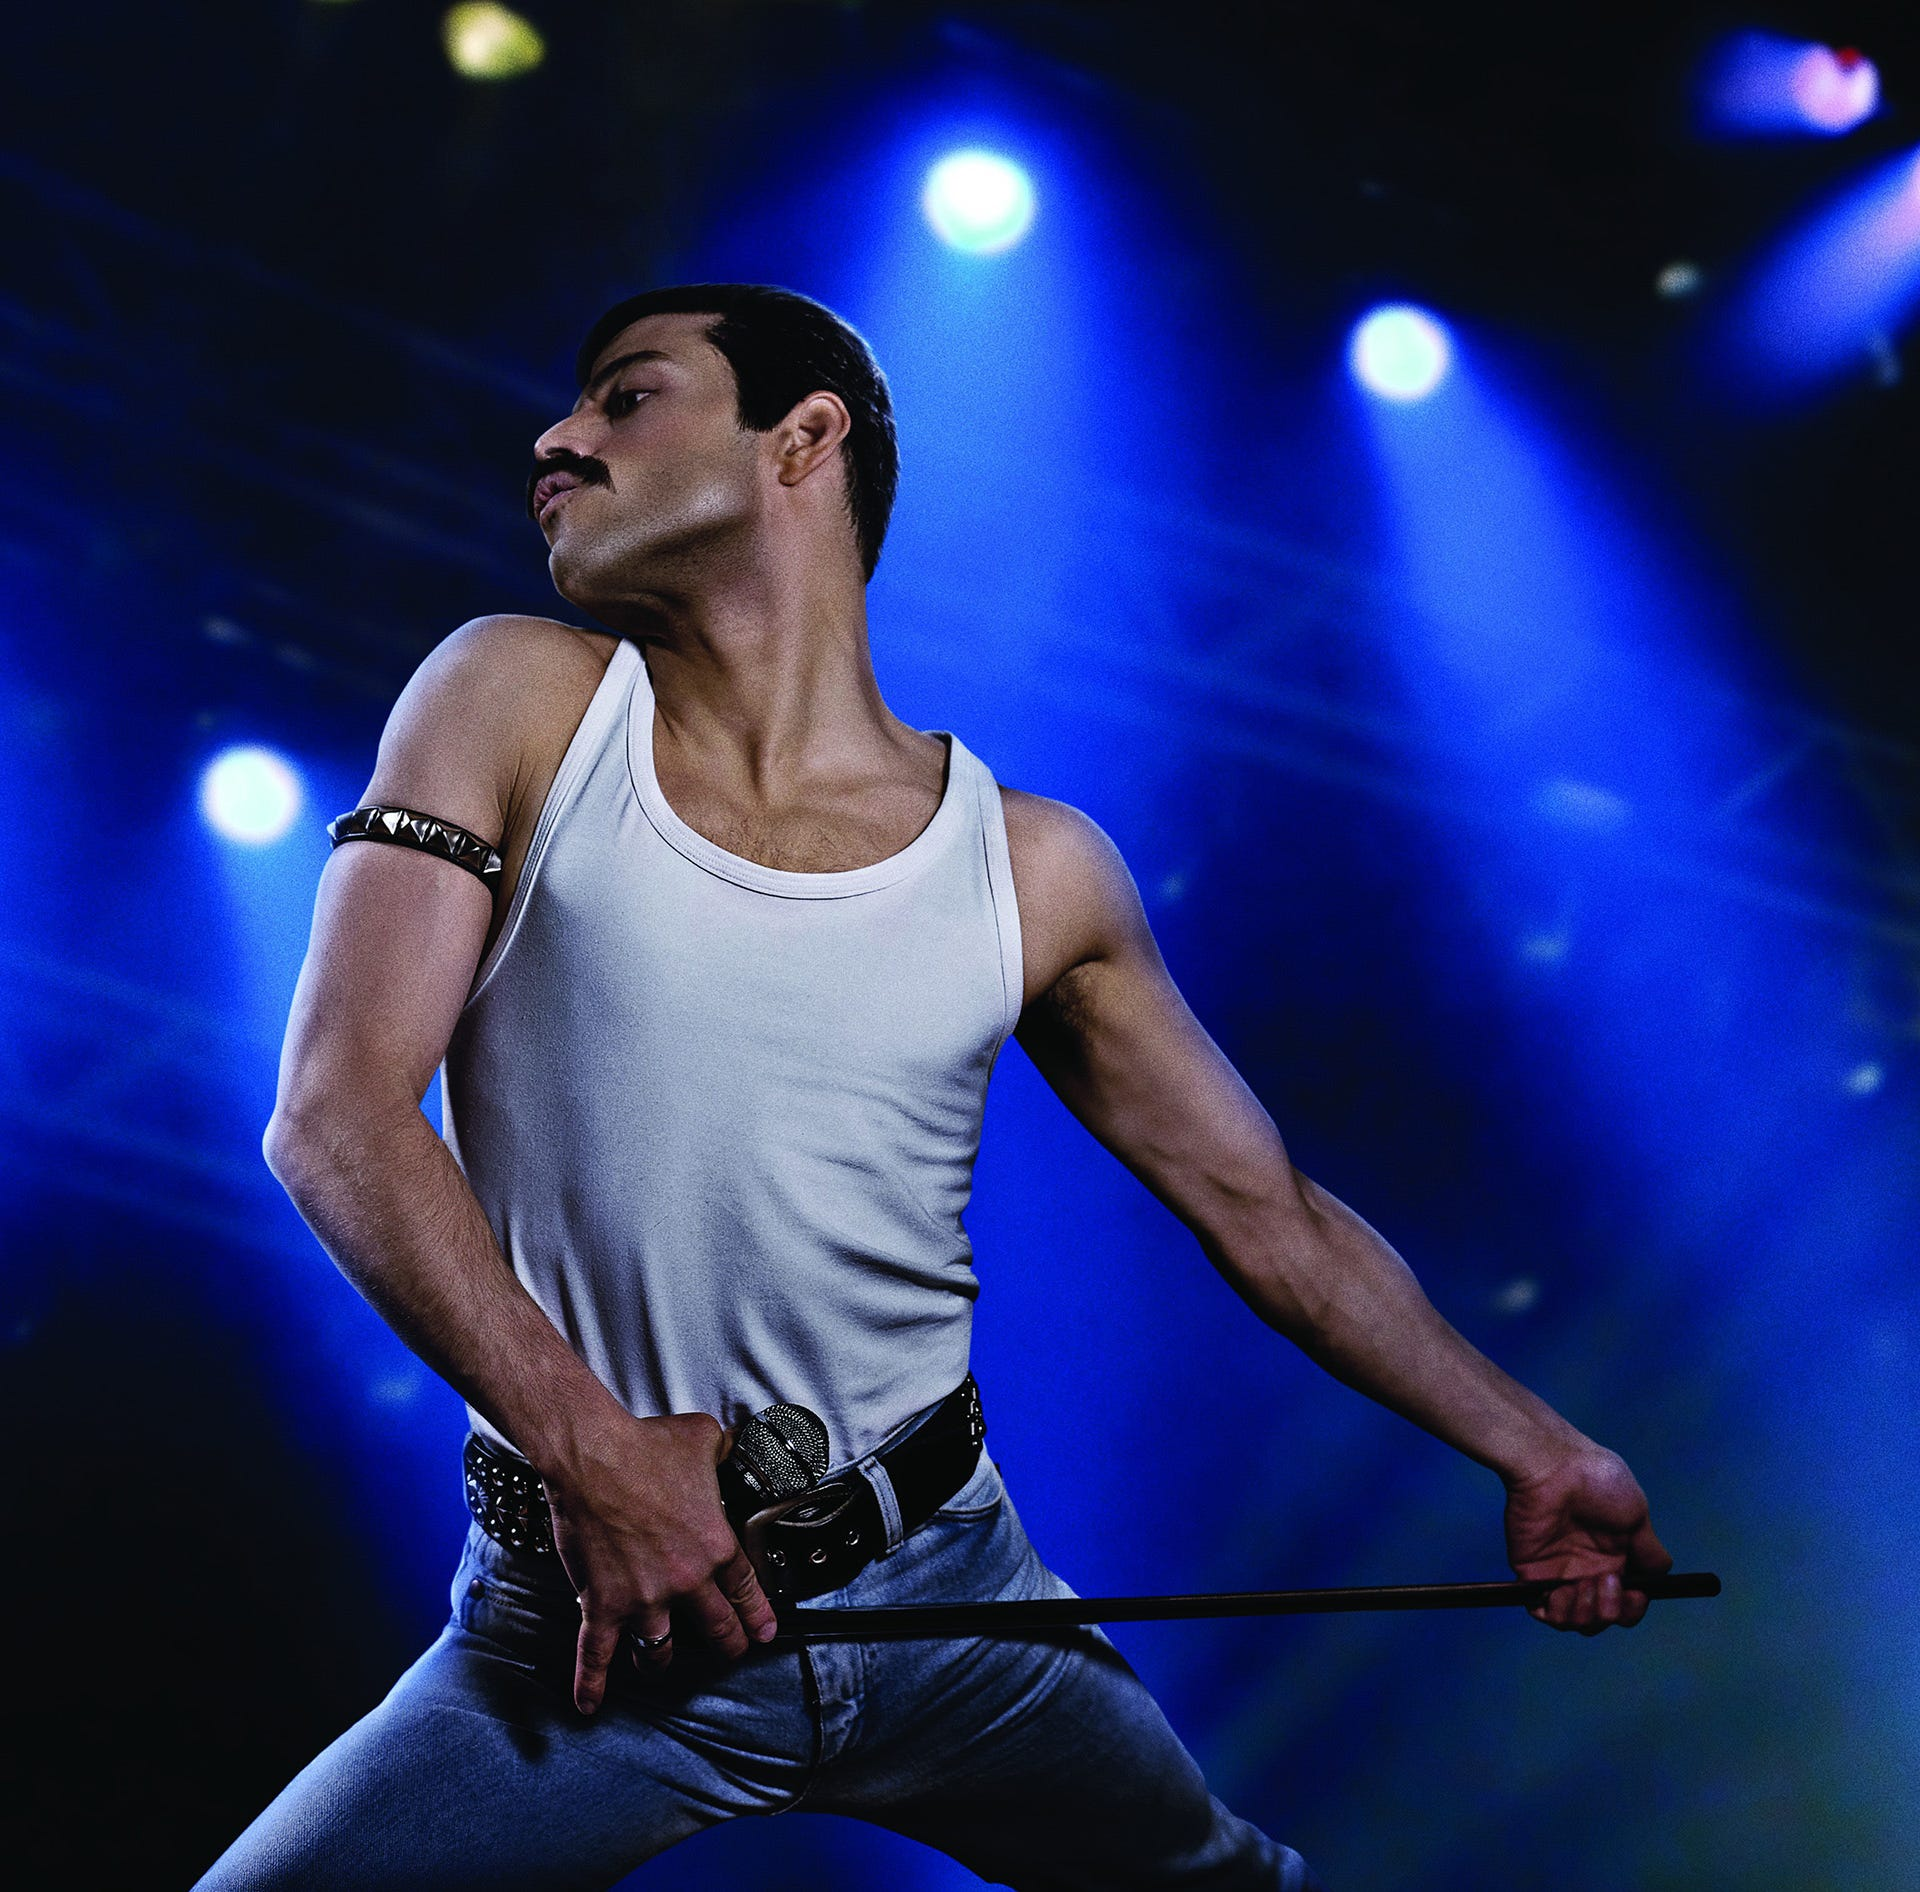 Robert Downey Jr. praises Rami Malek on TIME's 100 most influential list